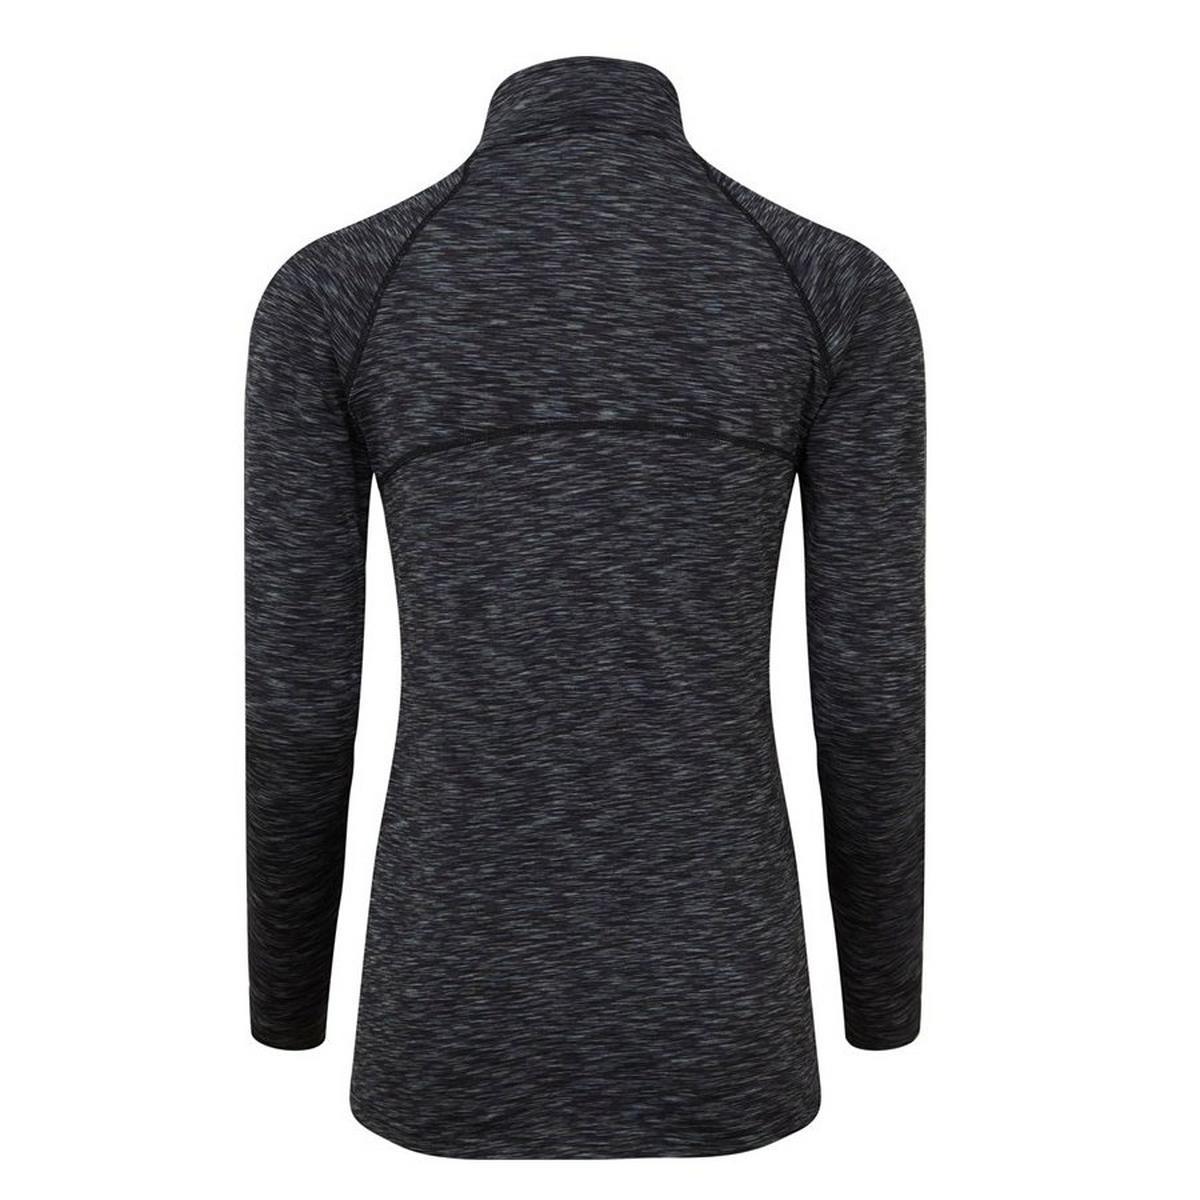 North Ridge Women's Ainslie Half Zip Pullover